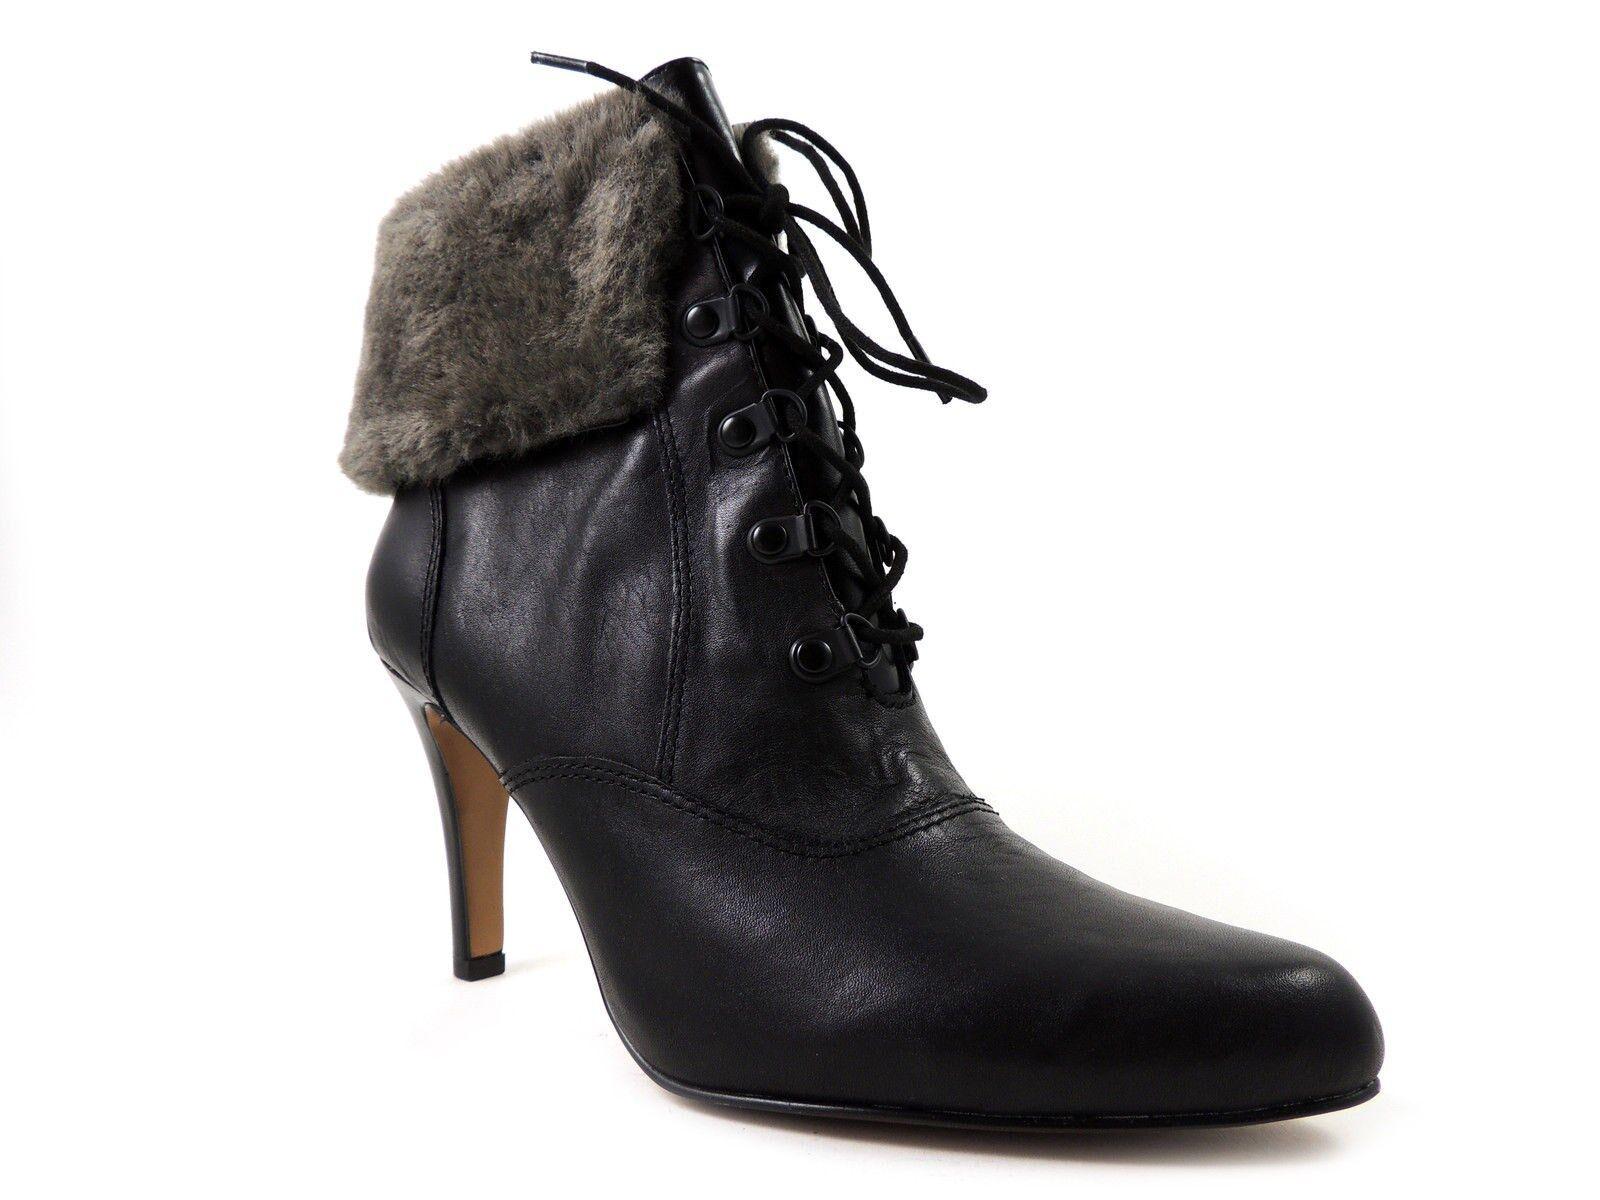 Ellen Tracy Women's shoes, Return Fashion - Ankle Boots Black Grey Leather 10